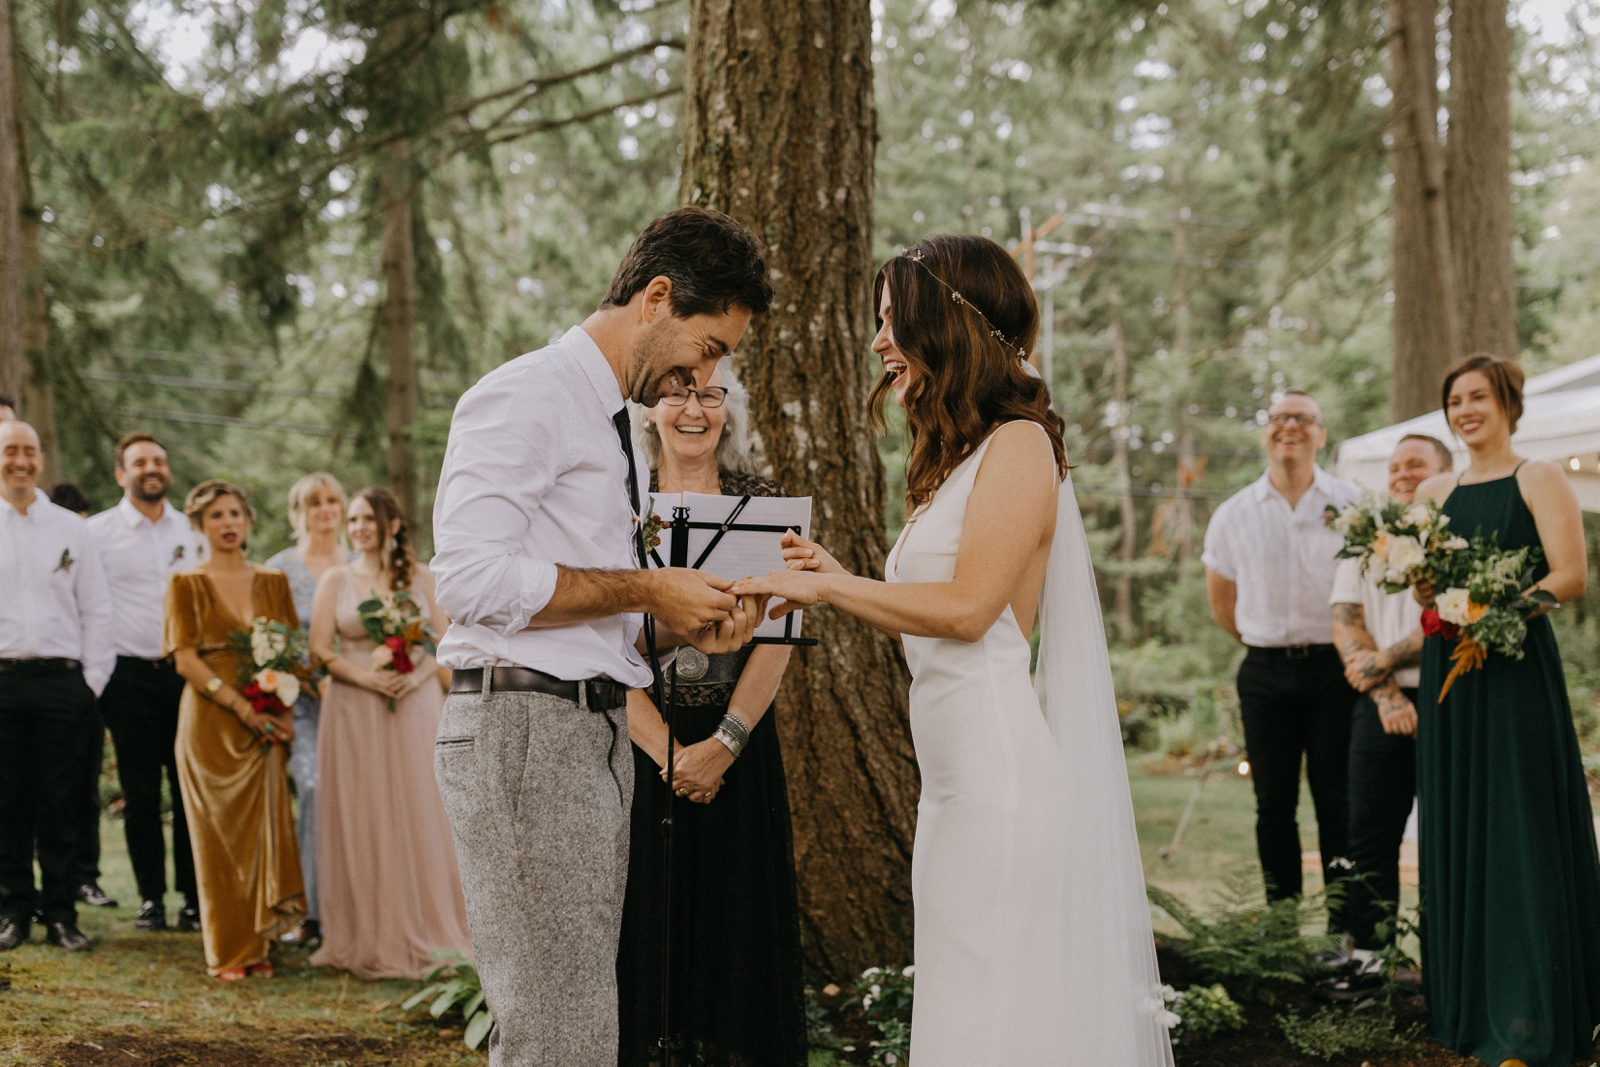 Matthew and Autumn Intimate Outdoor Backyard Wedding_0153